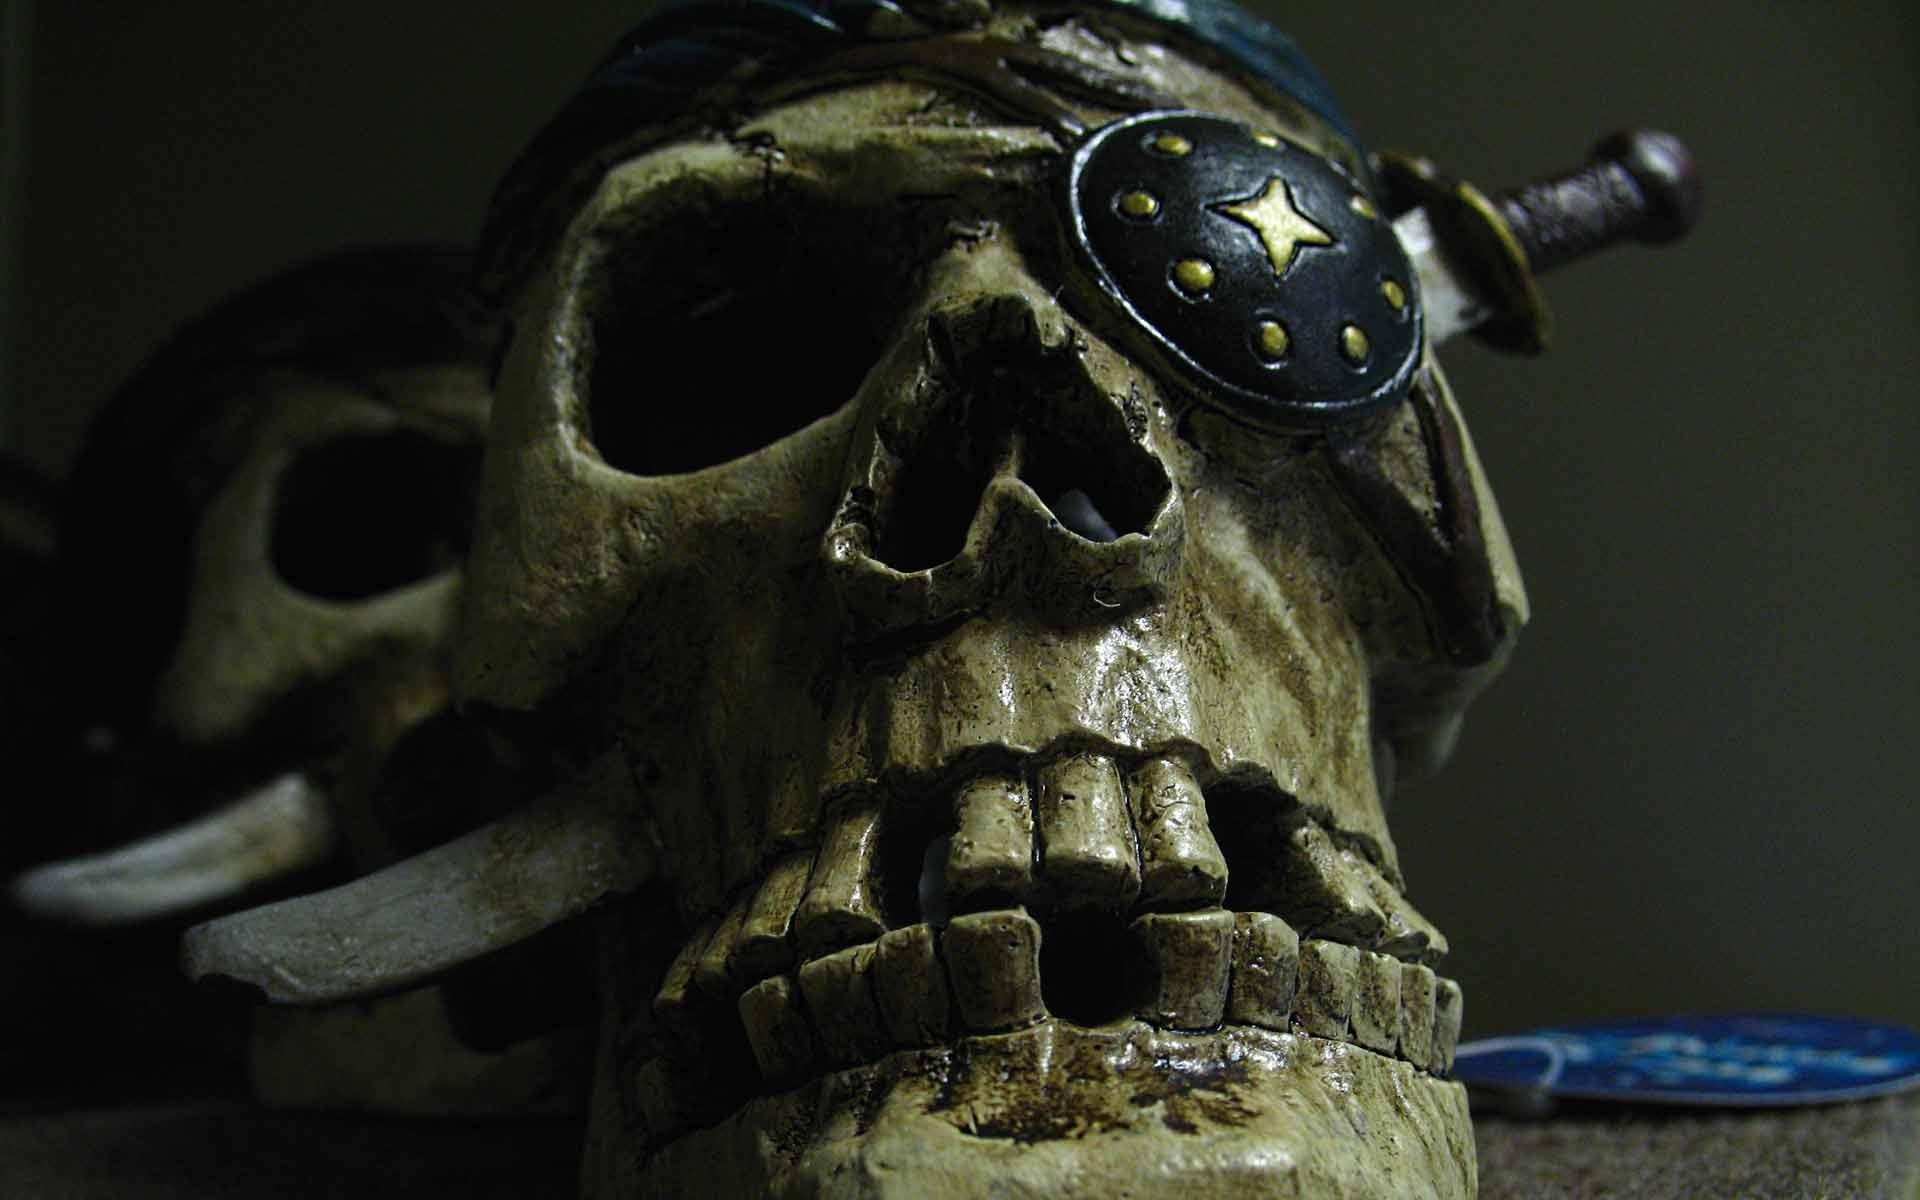 zombie skull wallpapers for desktop - photo #16